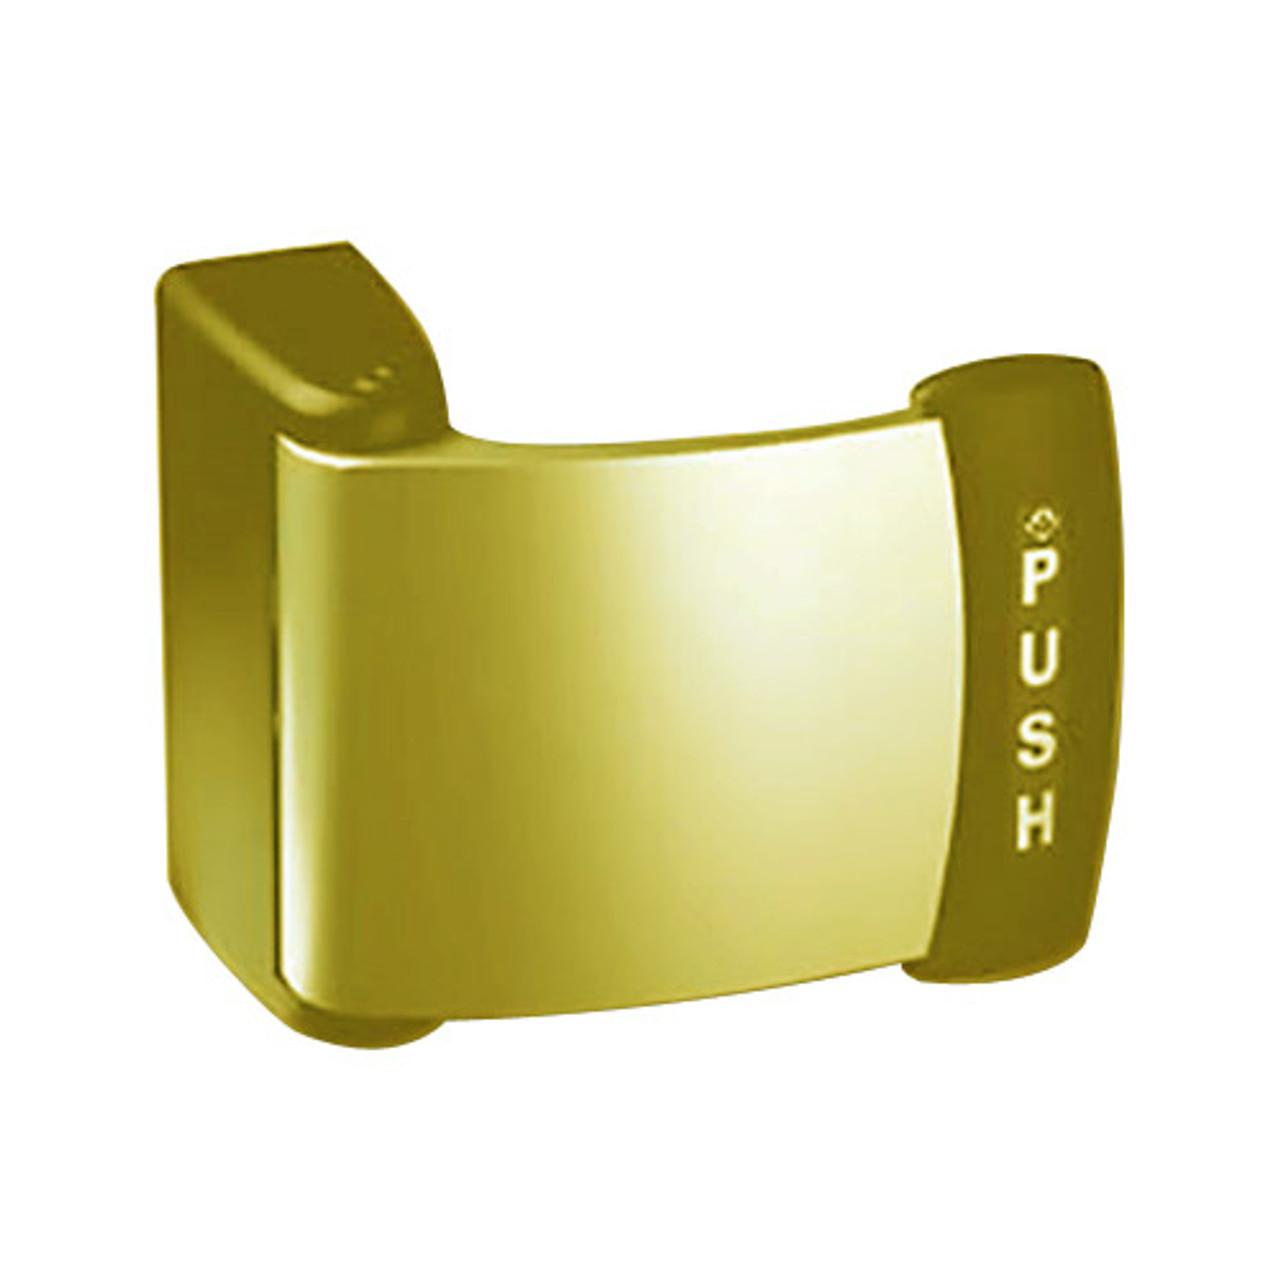 4591-02-03-US3 Adams Rite Deadlatch Paddle in Bright Brass Finish